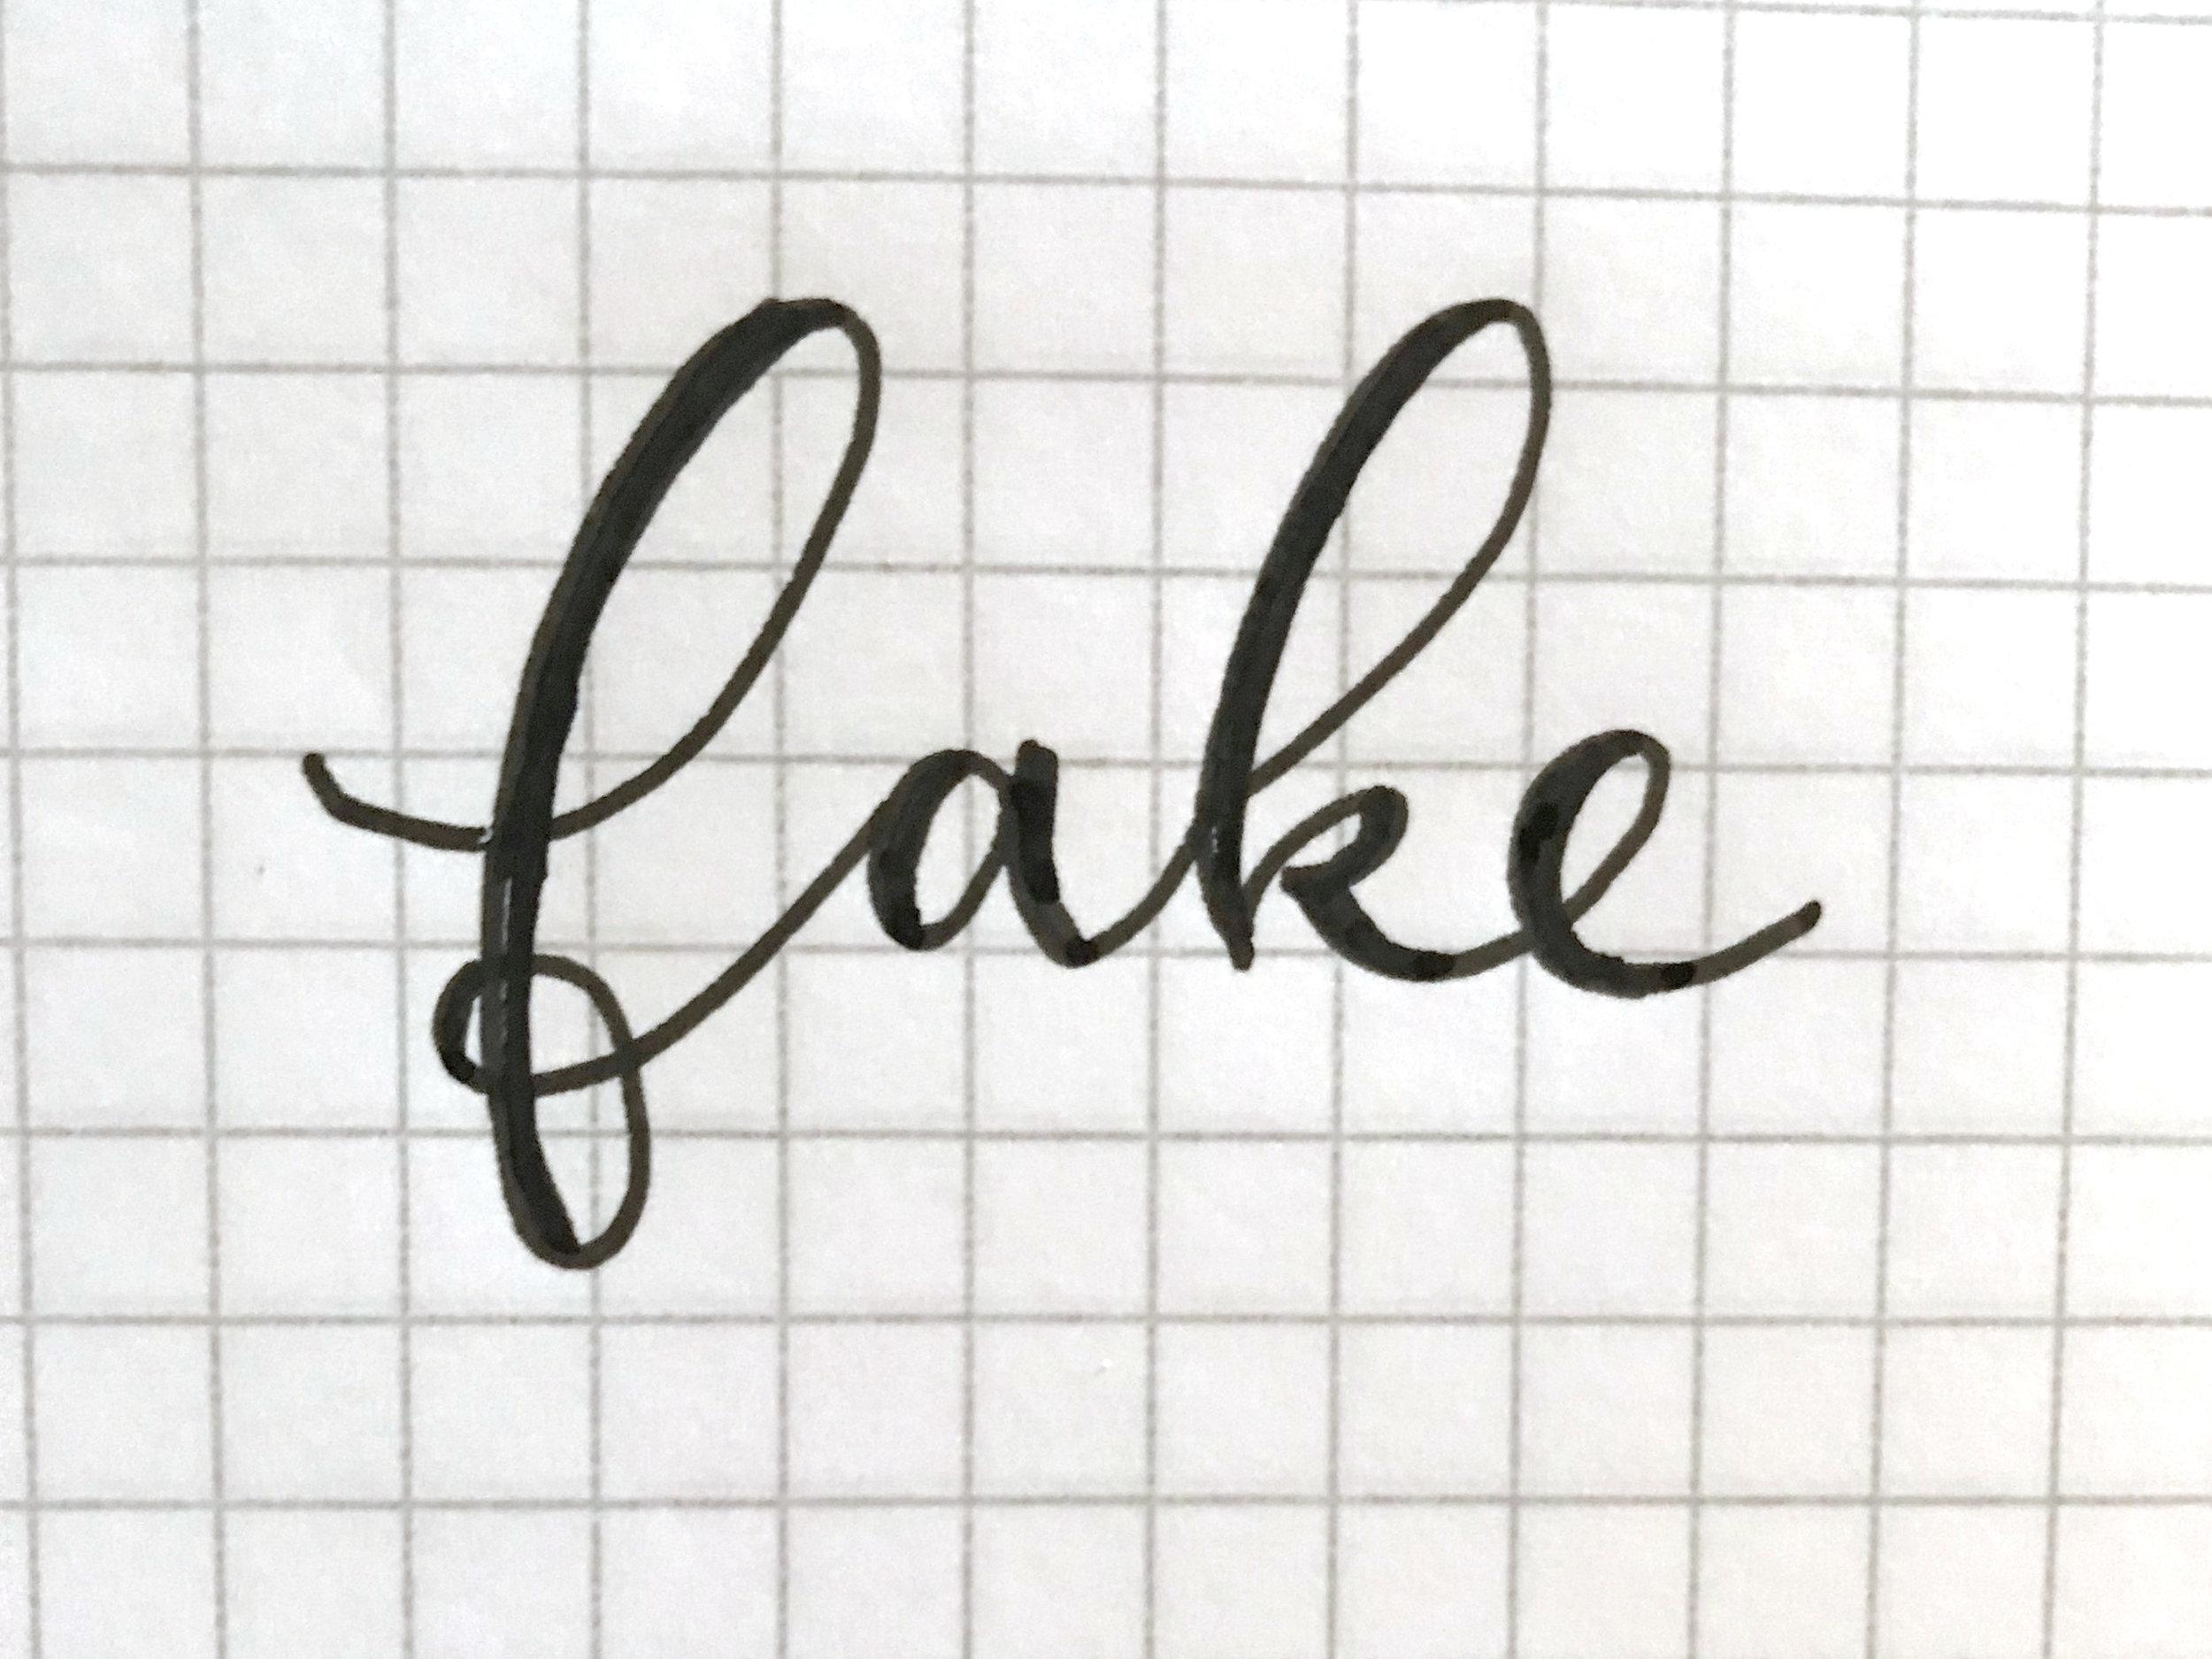 Fiber & Dye   No-Nib Calligraphy in just 3 steps